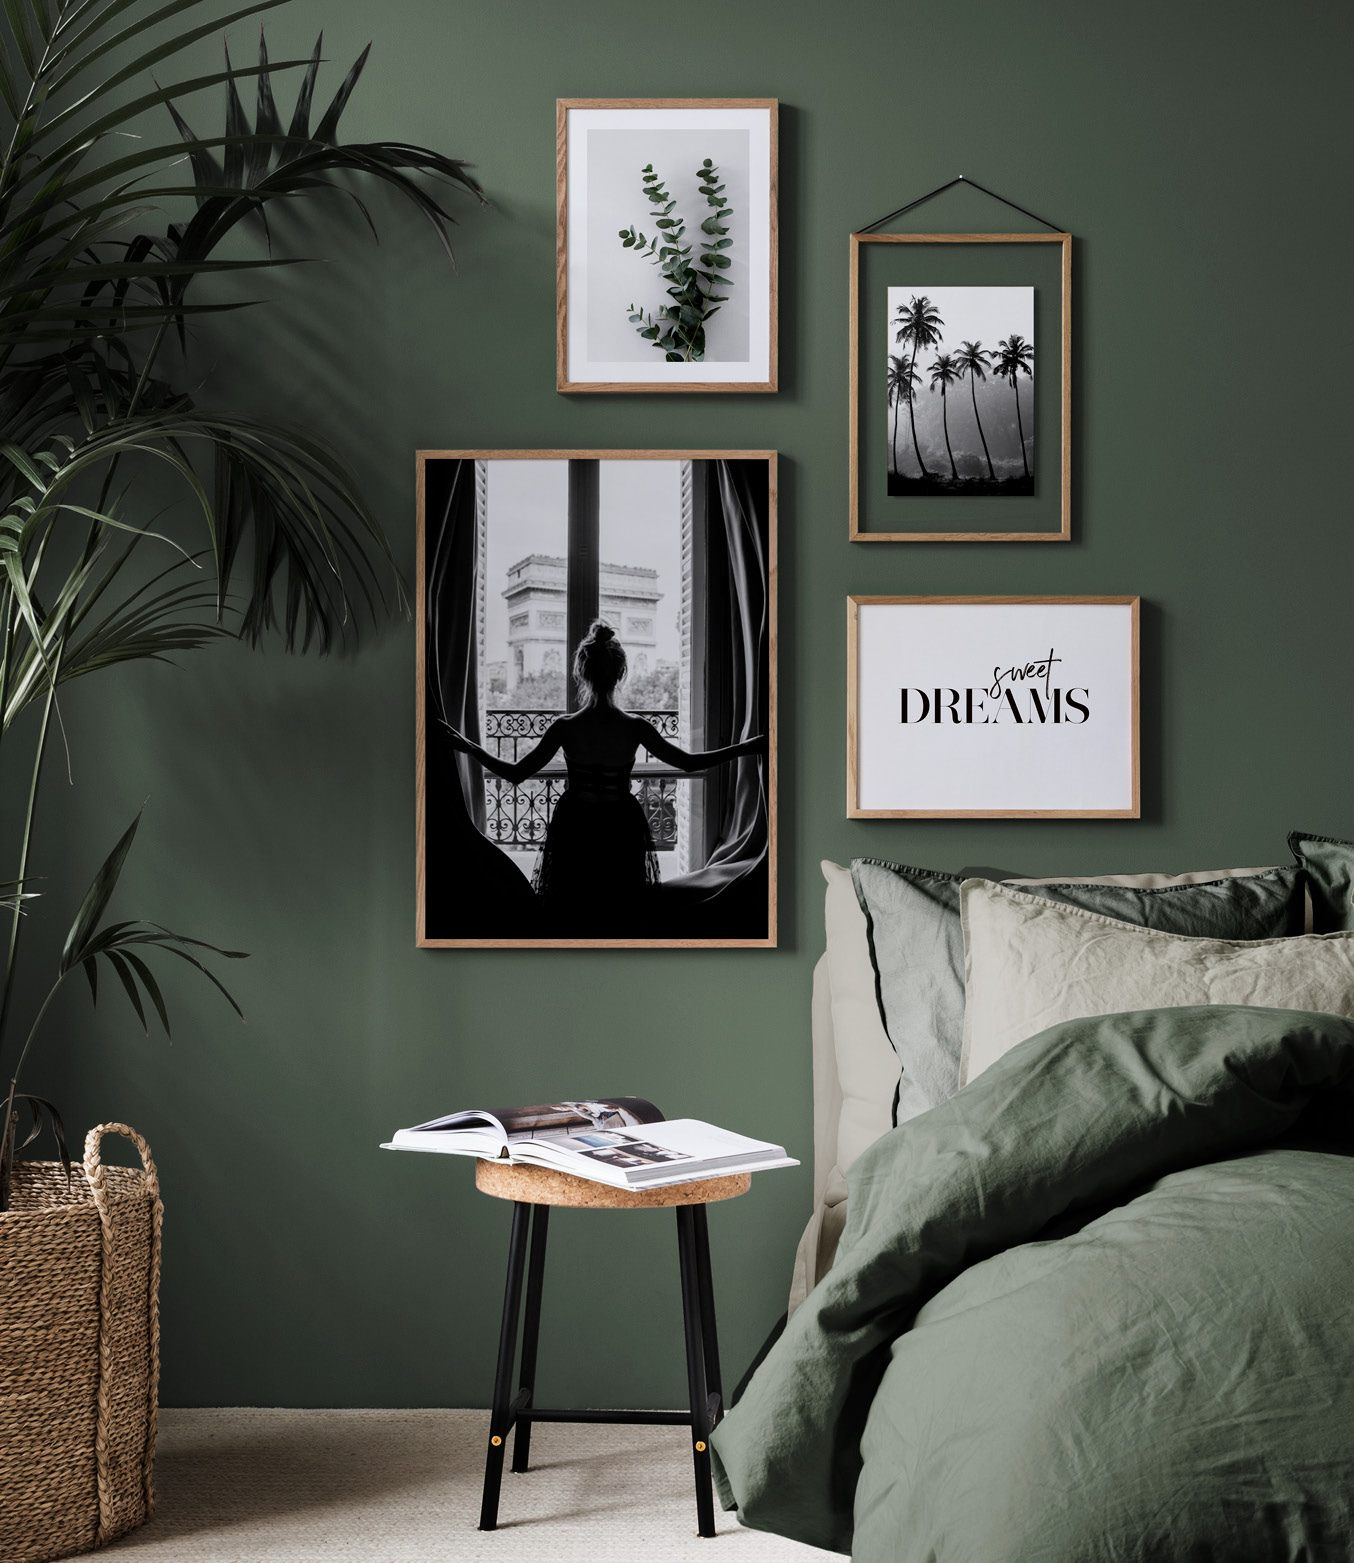 interiorlicious collage in de slaapkamer